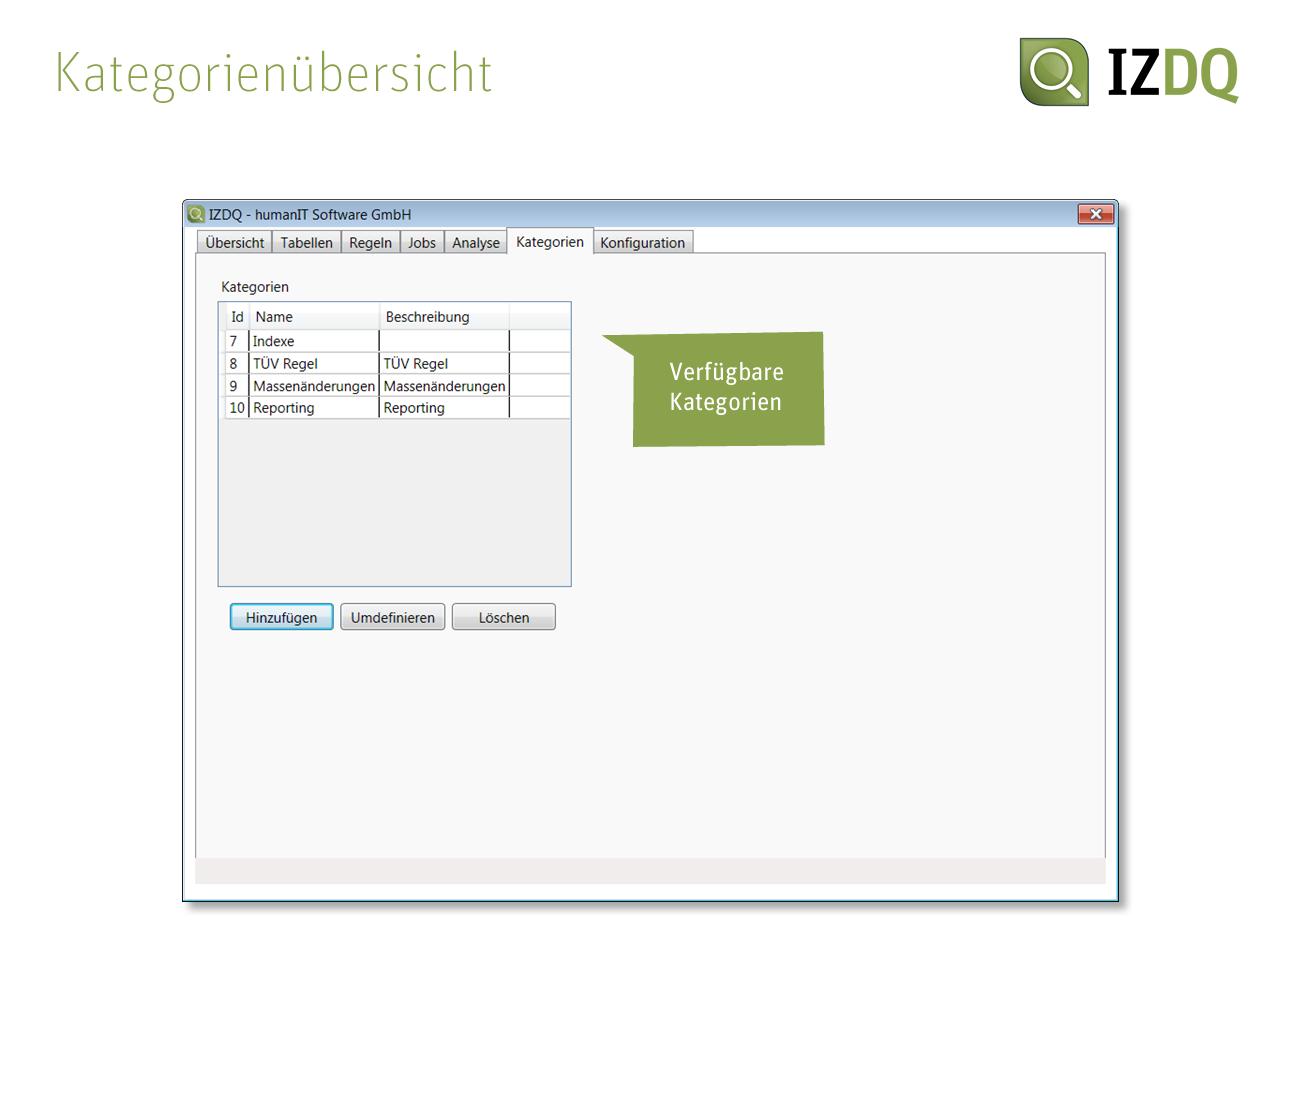 Screenshot IZDQ Kategorienübersicht